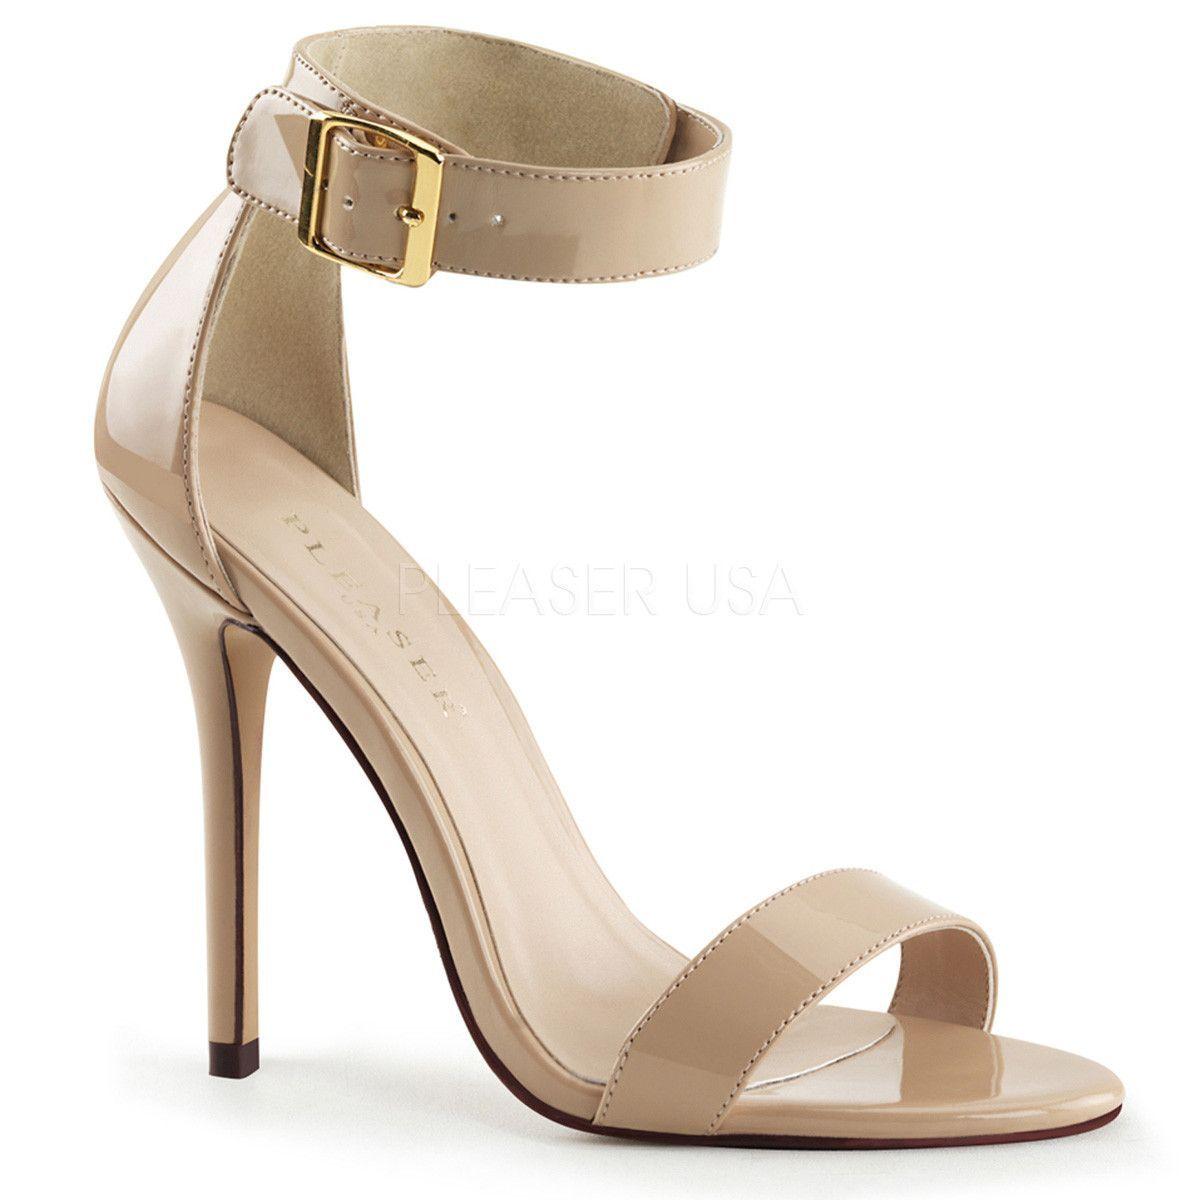 Pleaser AMUSE-10 Cream Patent Ankle Strap Sandals | Ankle strap sandals,  Ankle straps and Strap sandals